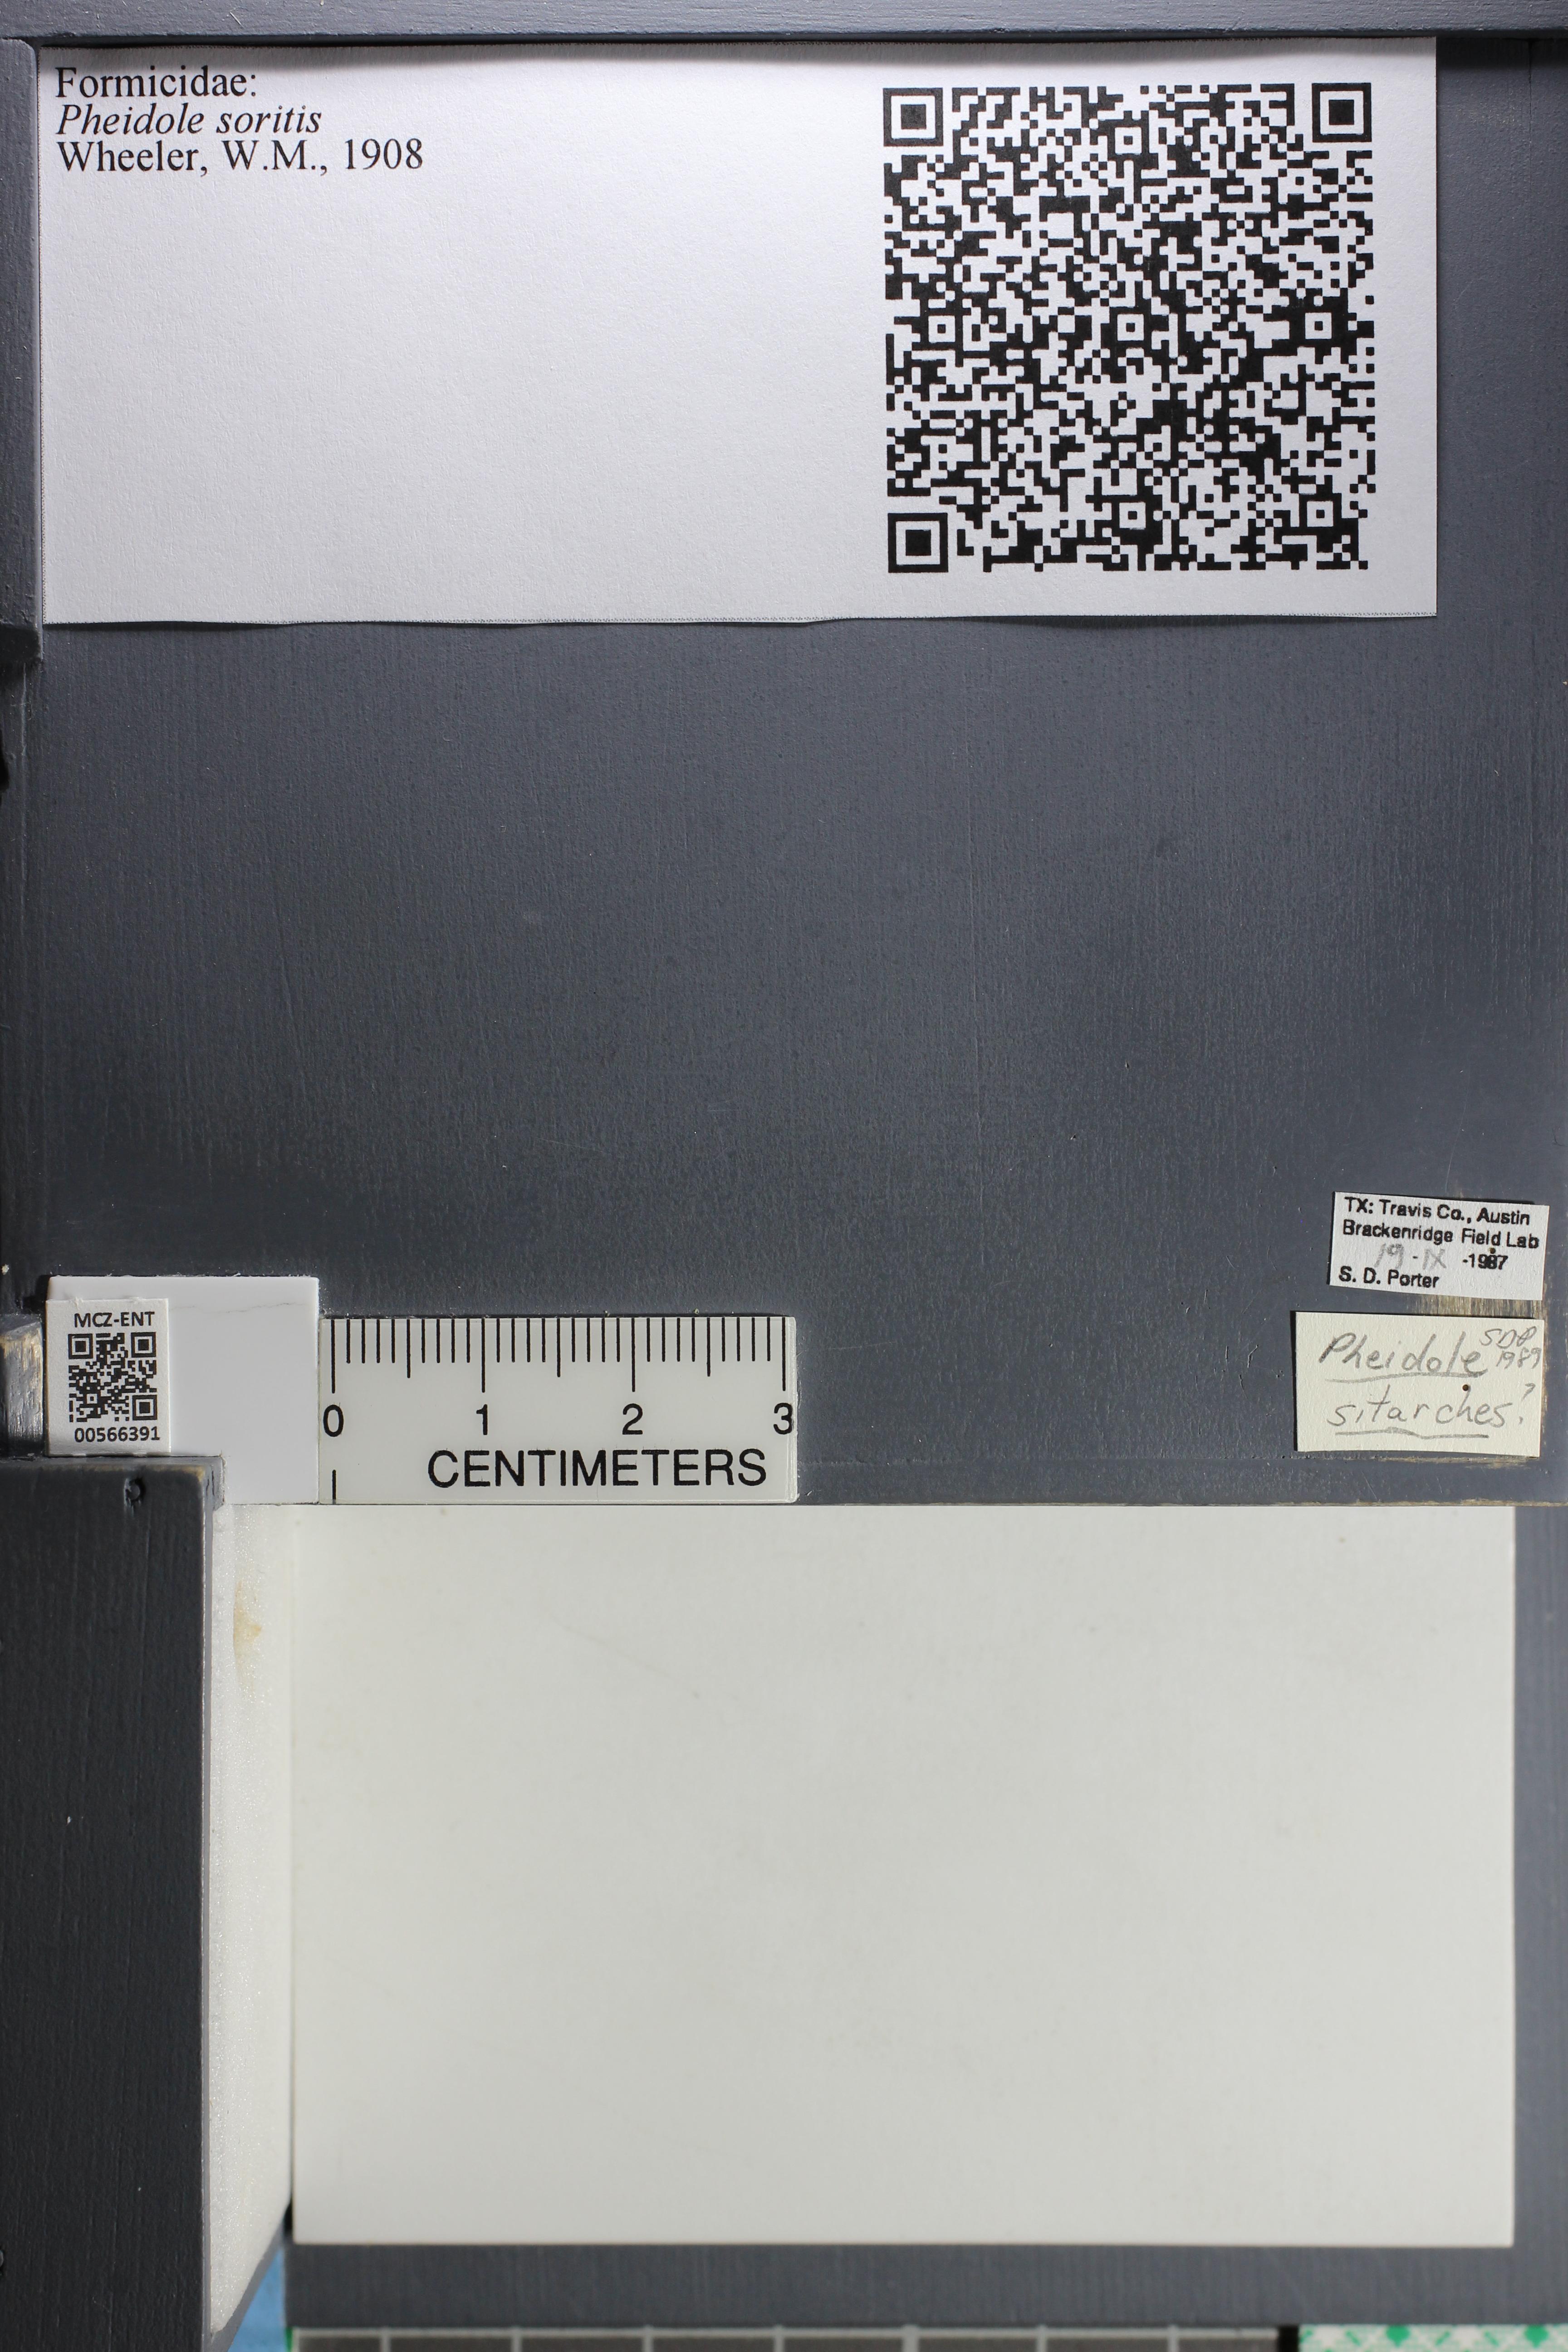 Media of type image, MCZ:Ent:566391 Identified as Pheidole soritis.